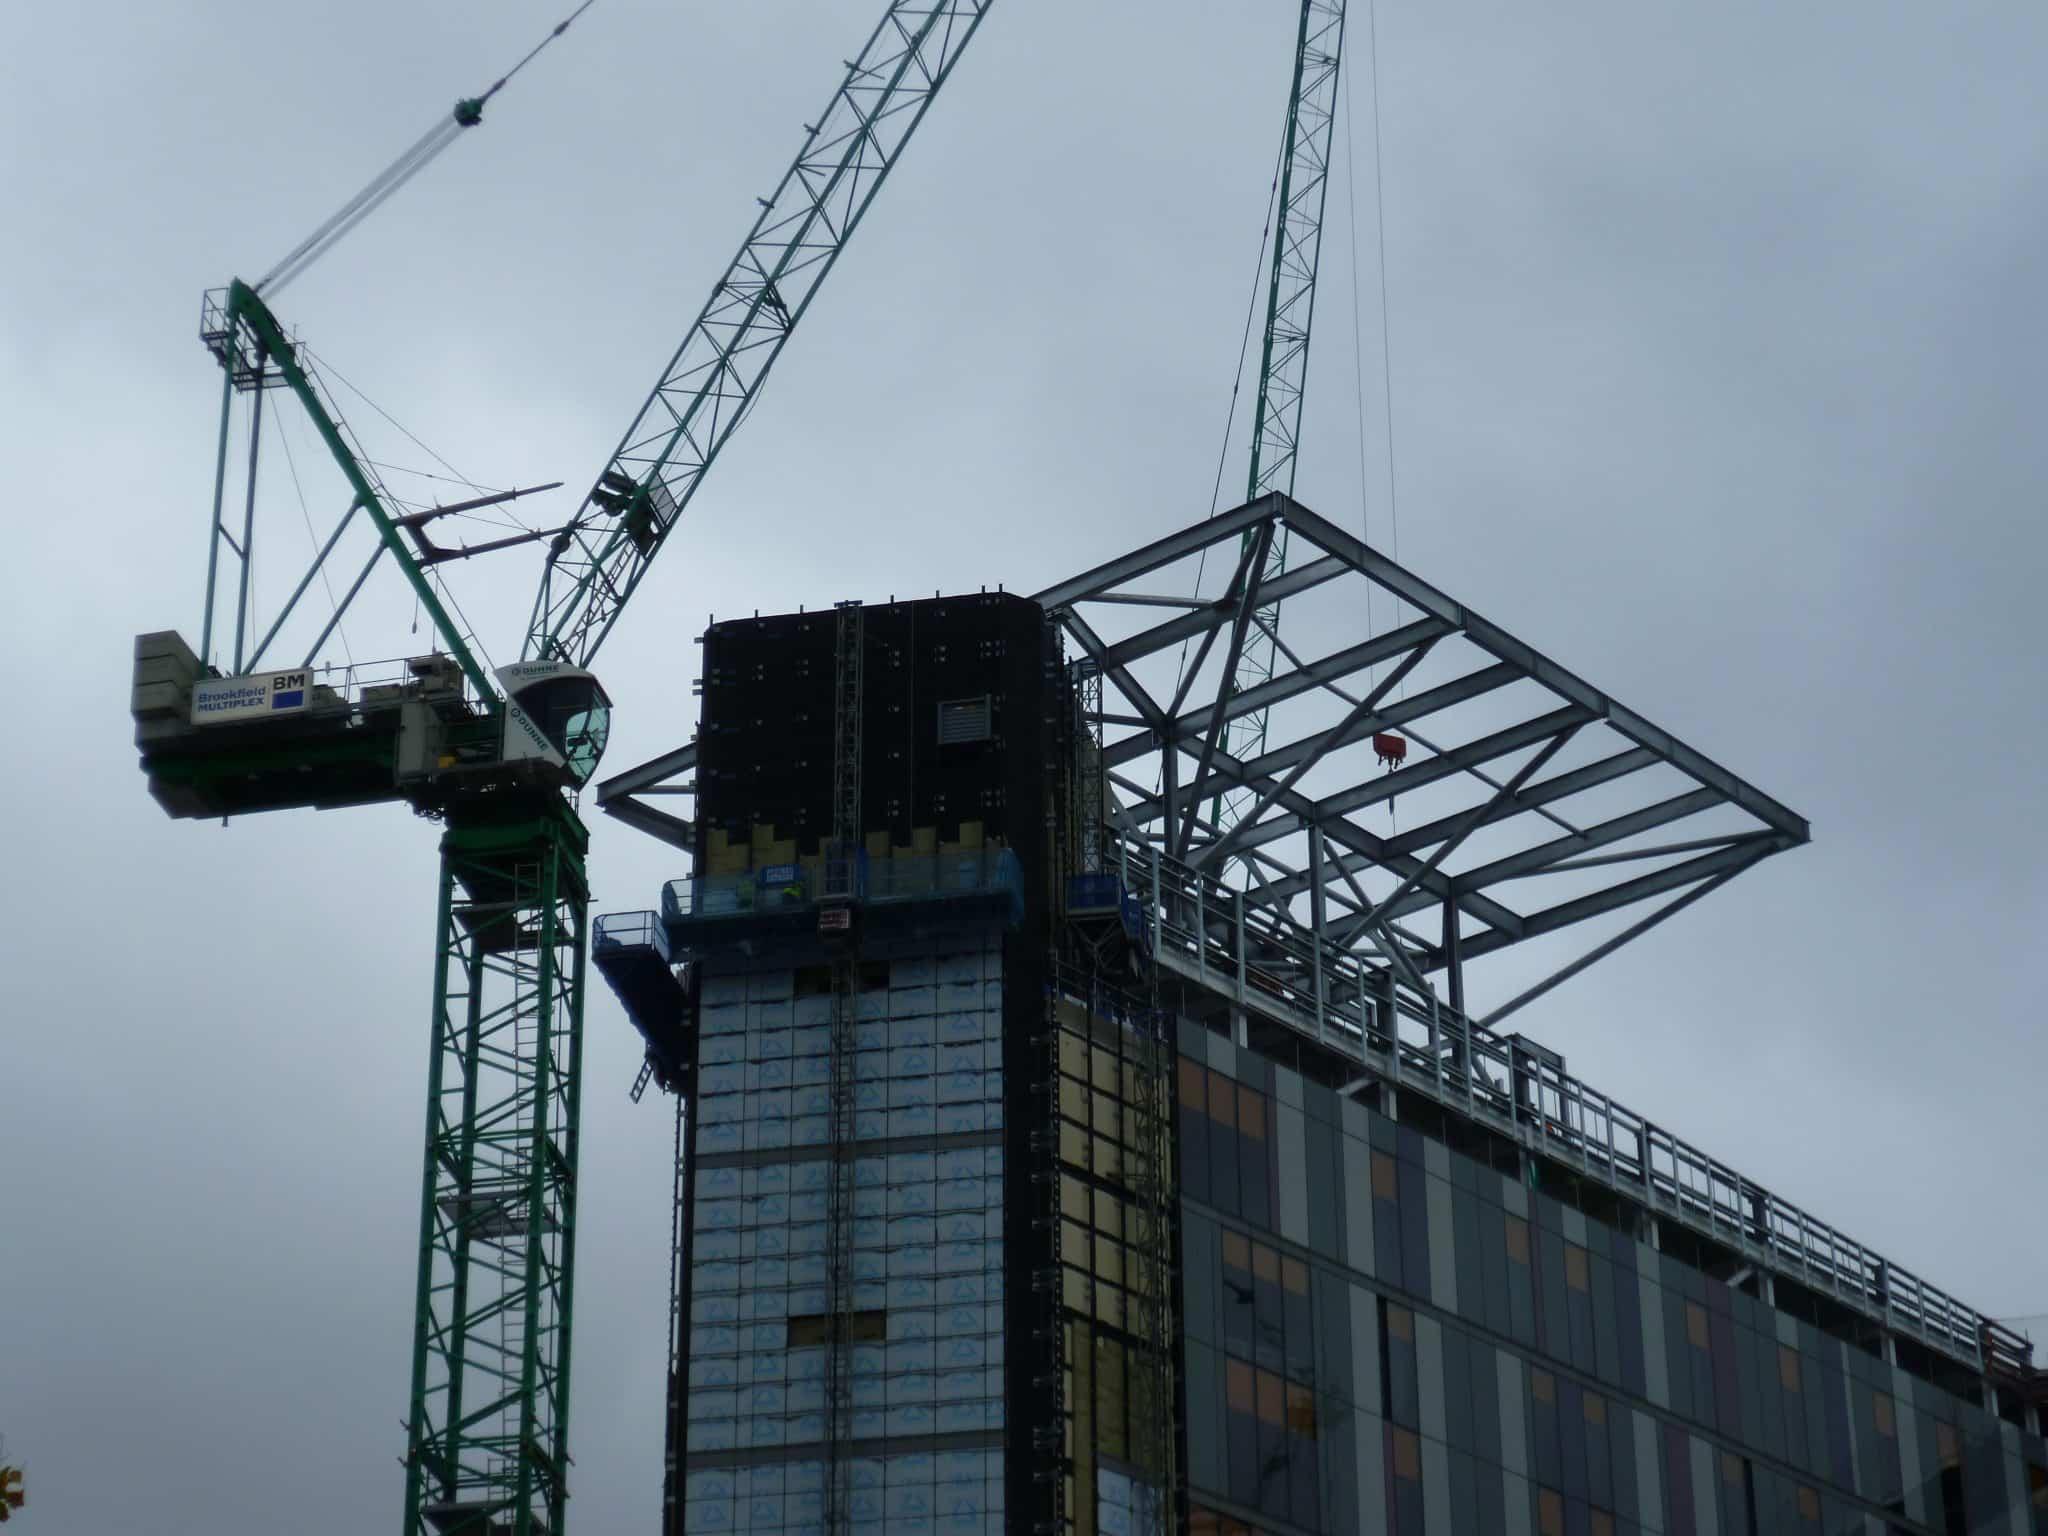 Queen Elizabeth University Hospital helipad erection